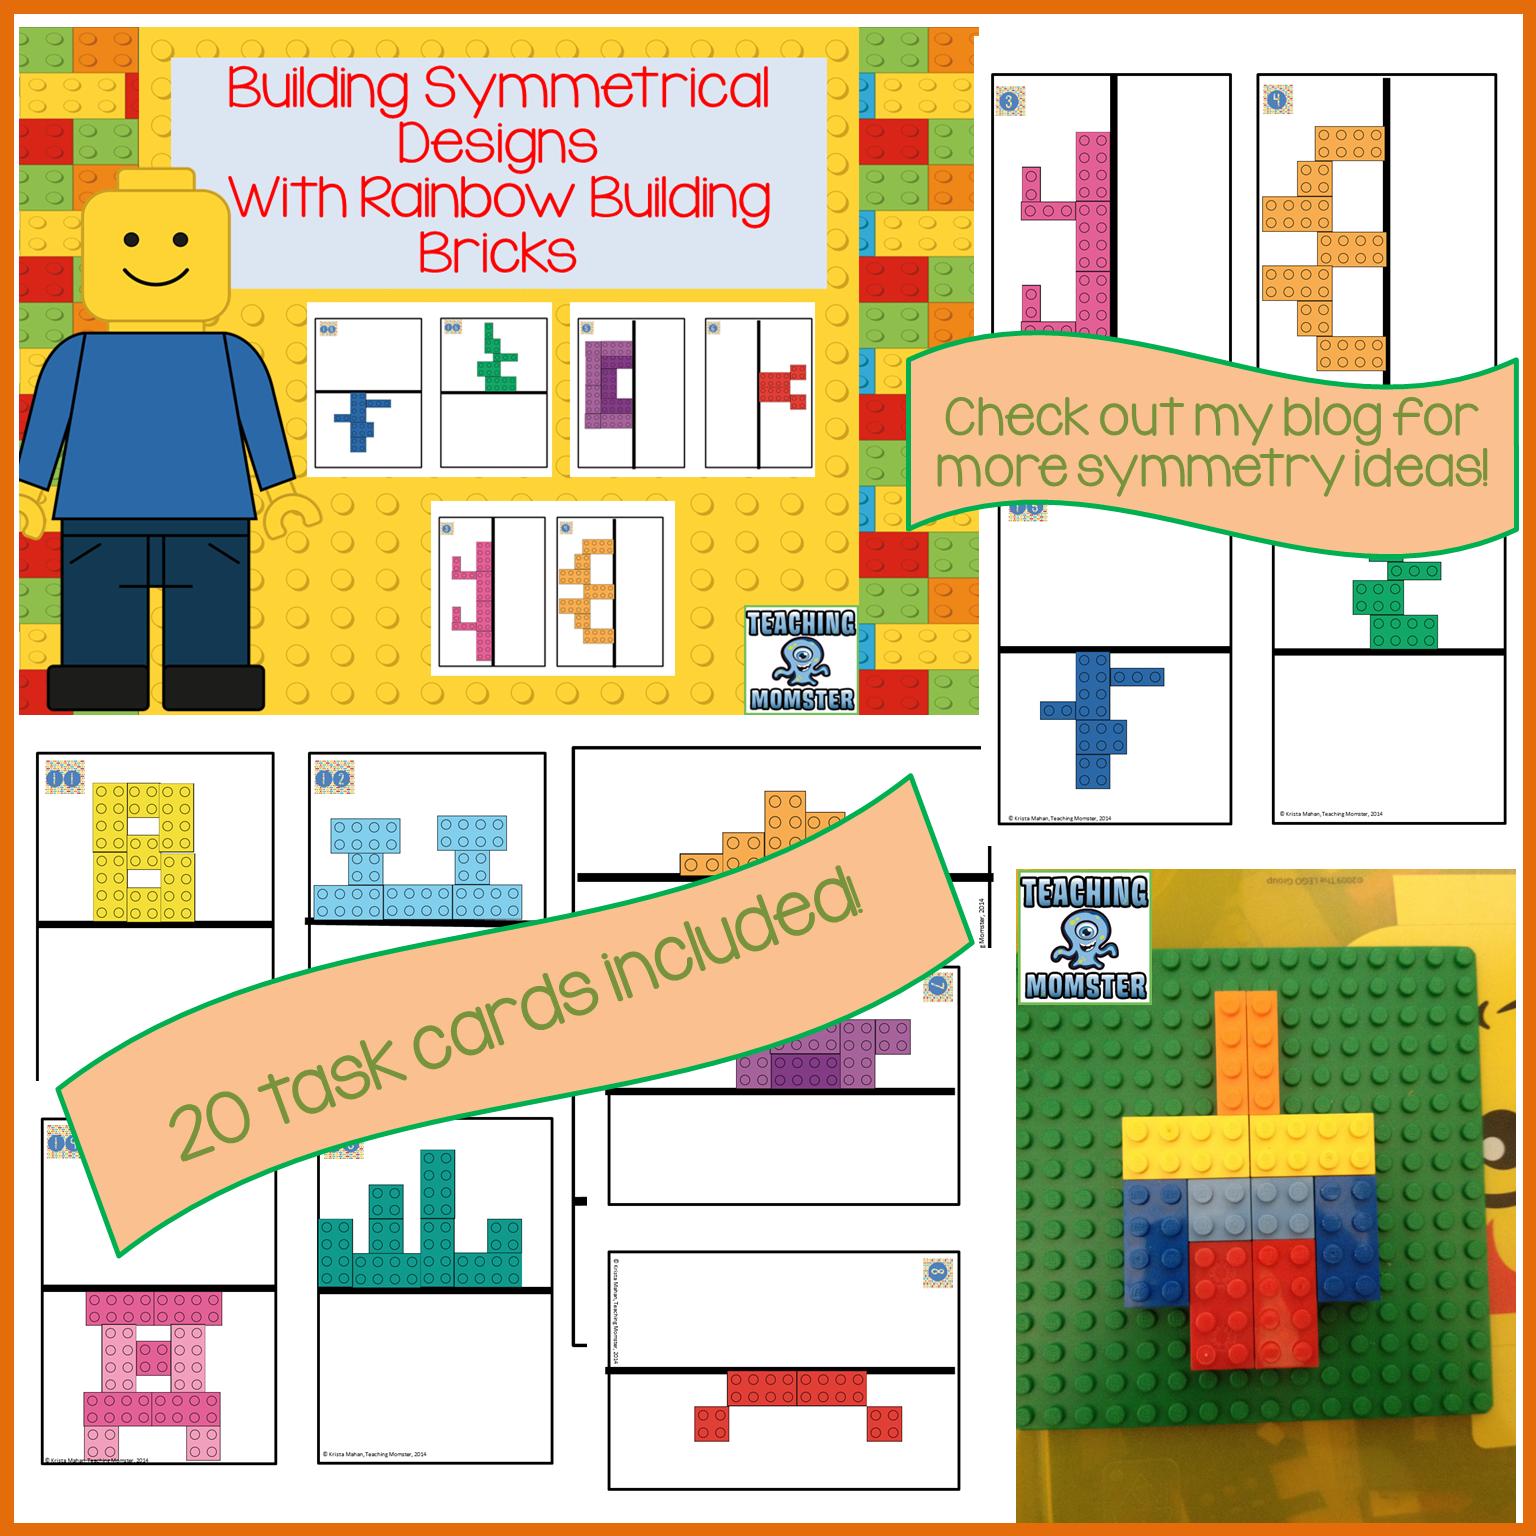 Symmetry Designs Using Building Bricks